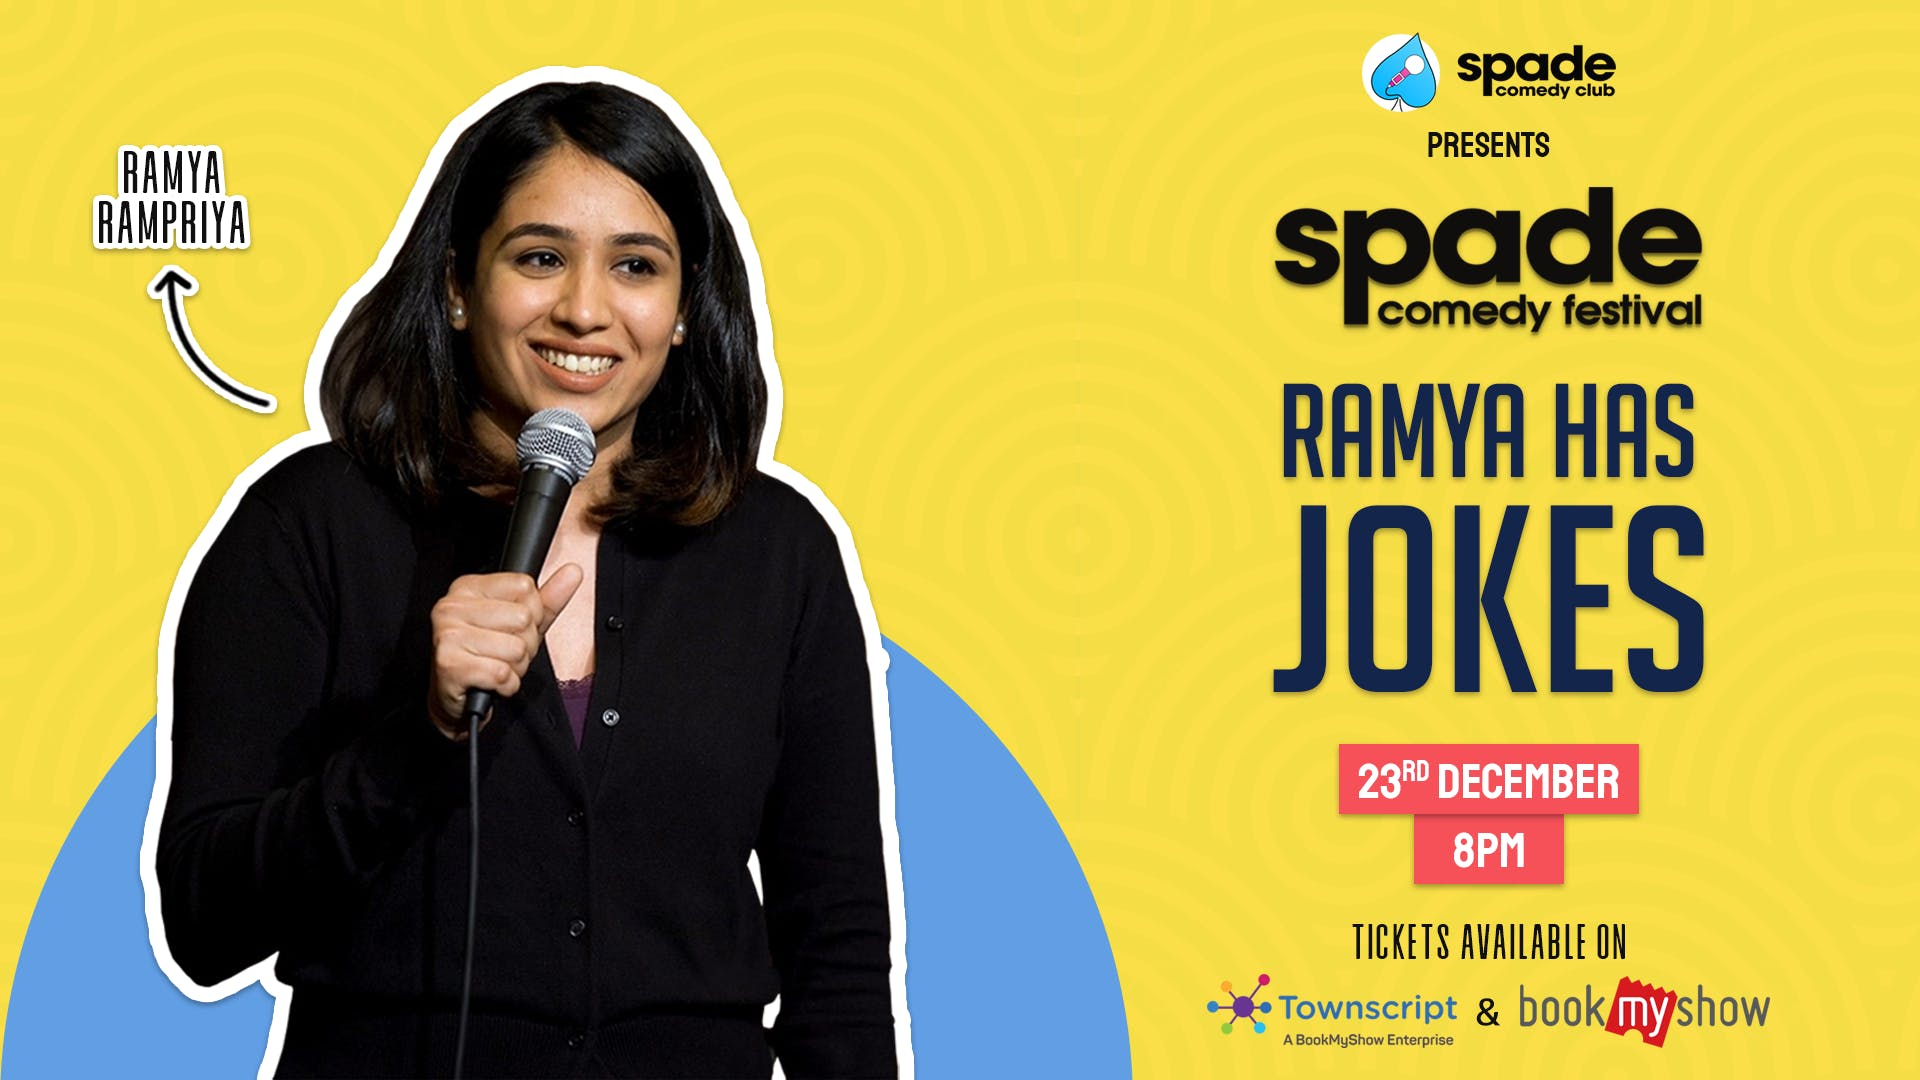 Ramya Has Jokes by Ramya Ramapriya at Spade Comedy Festival